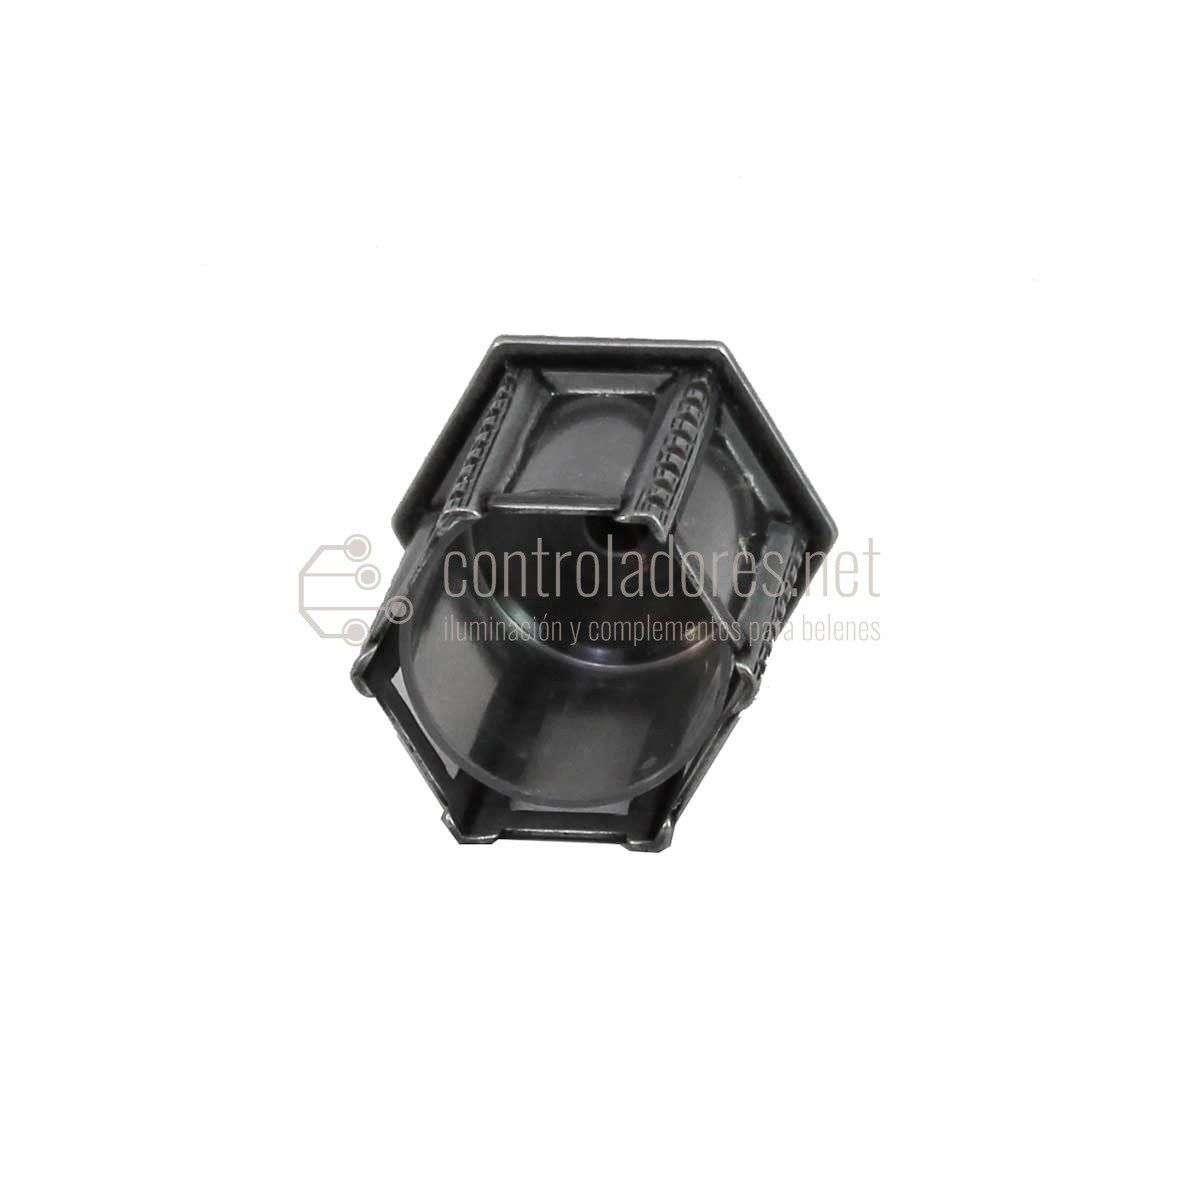 Farol hexagonal de metal